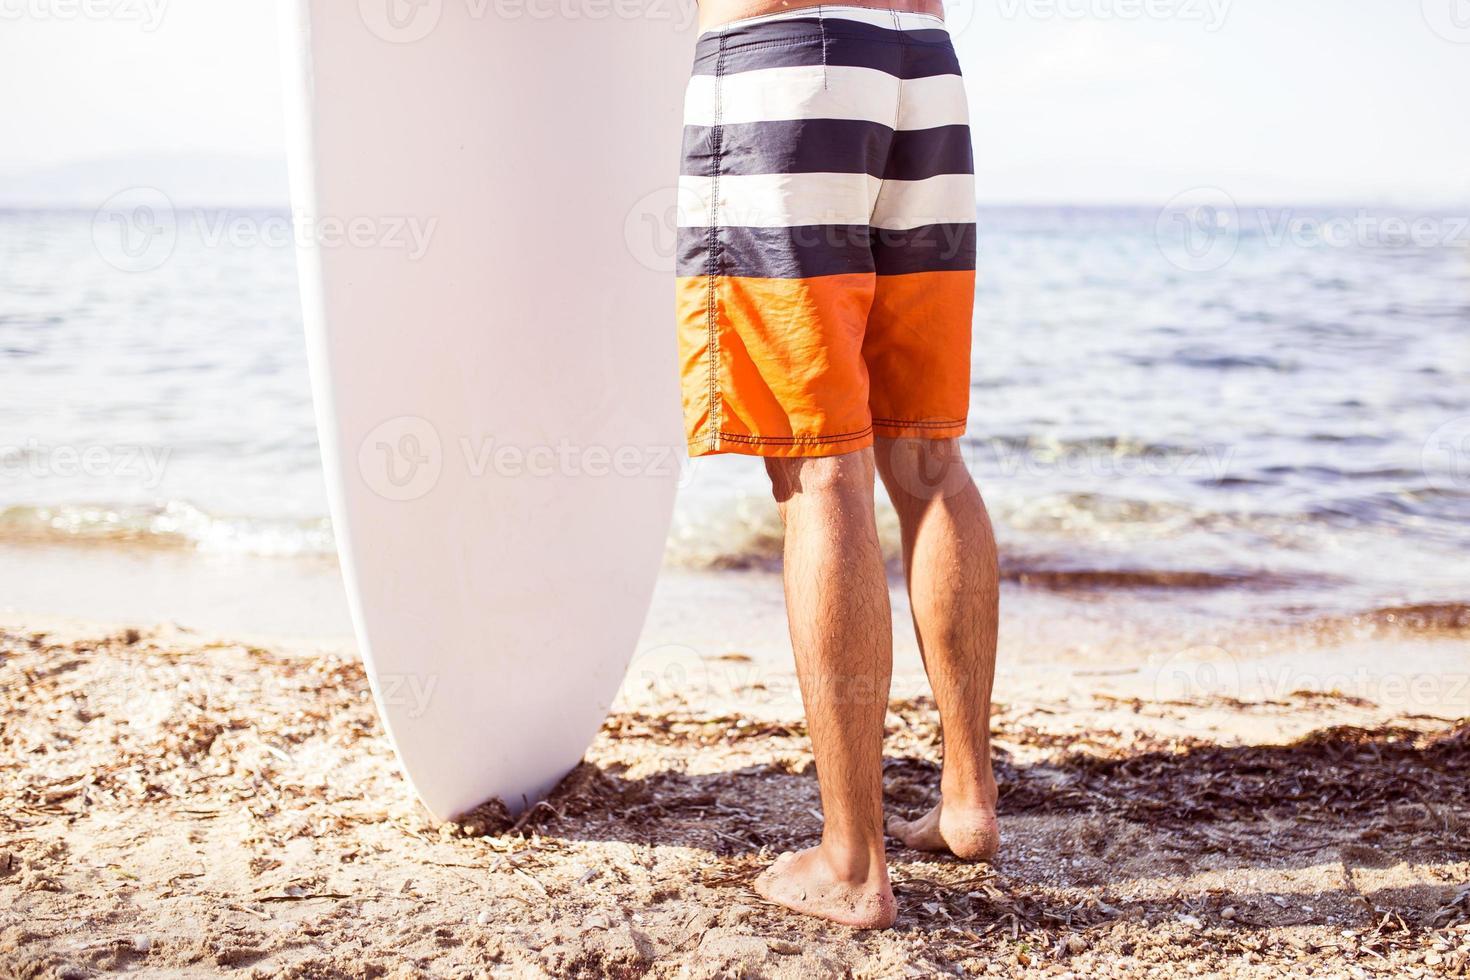 surfa, surfa, strand. surfer holding surfer board foto